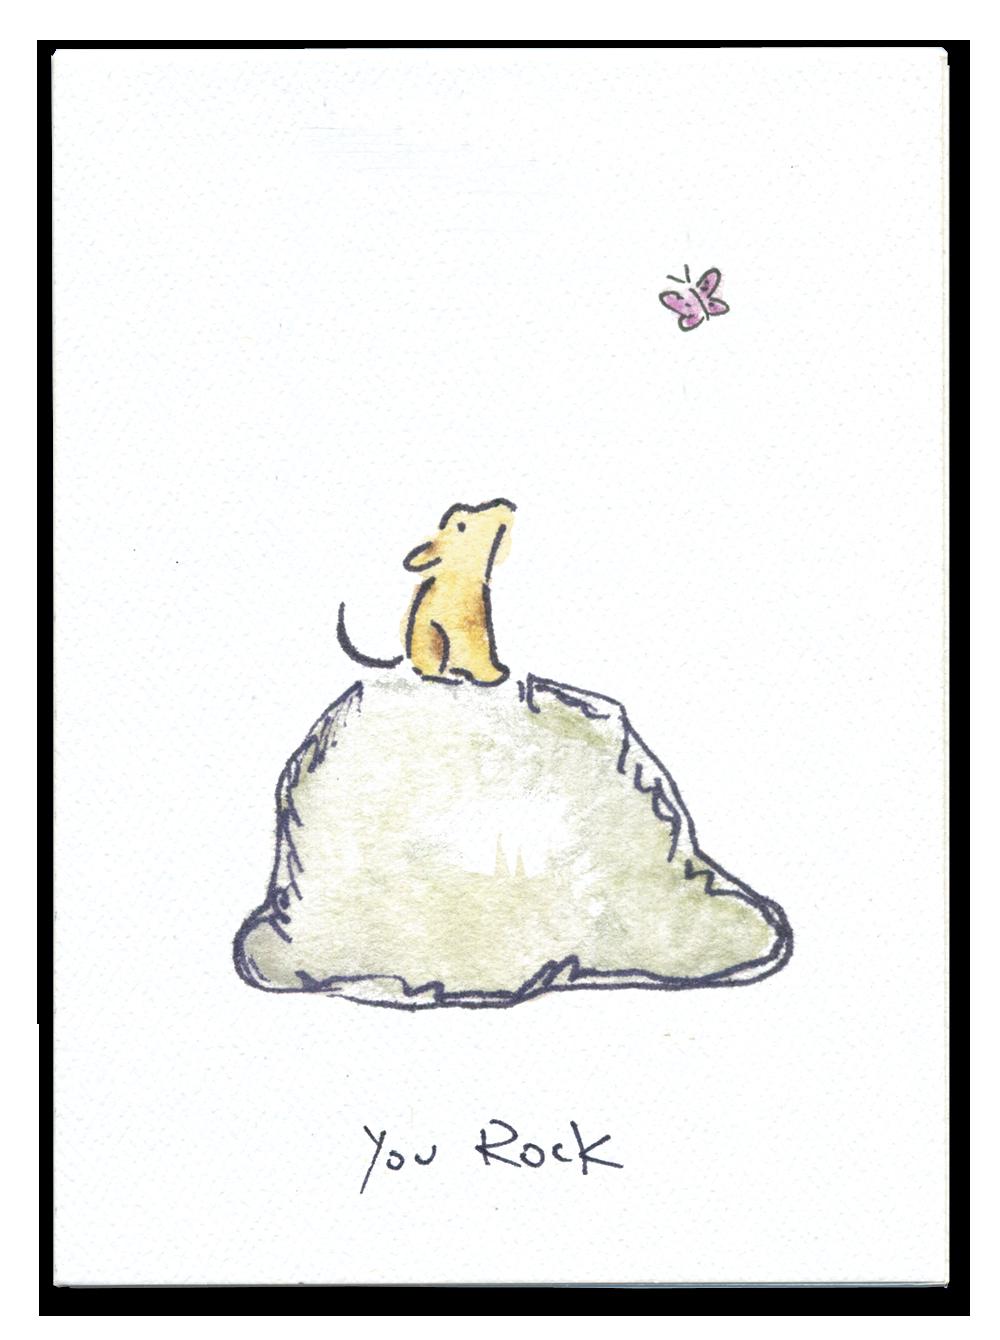 You Rock (Dog)